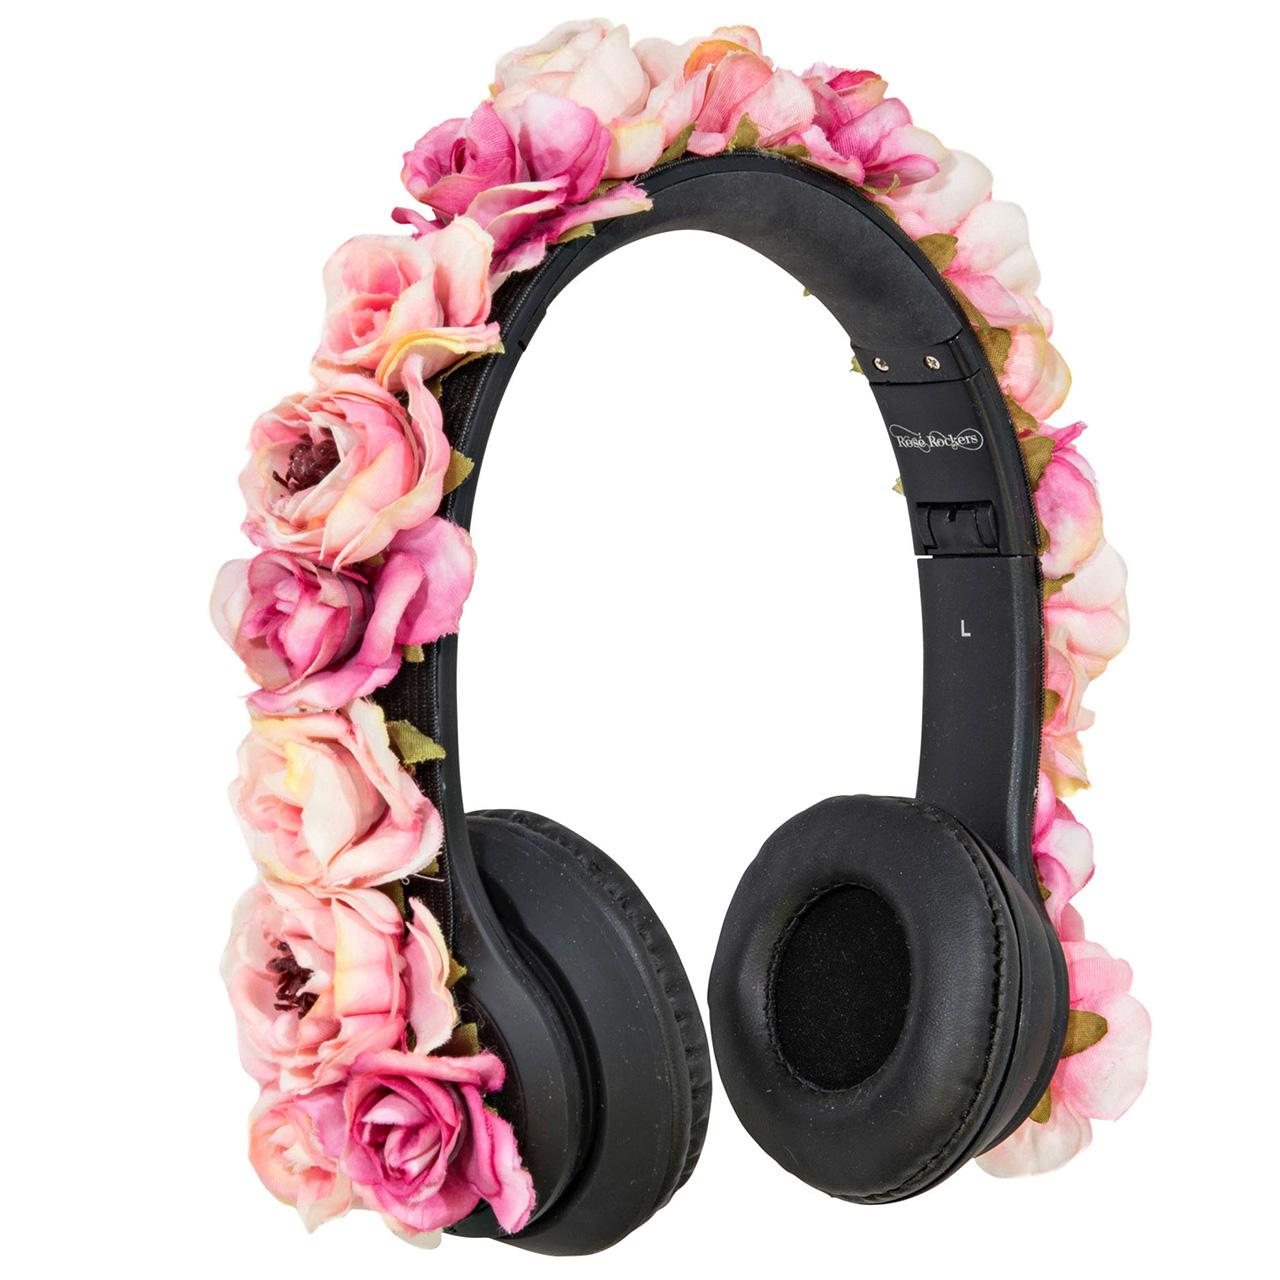 Rose Rockers Headphones